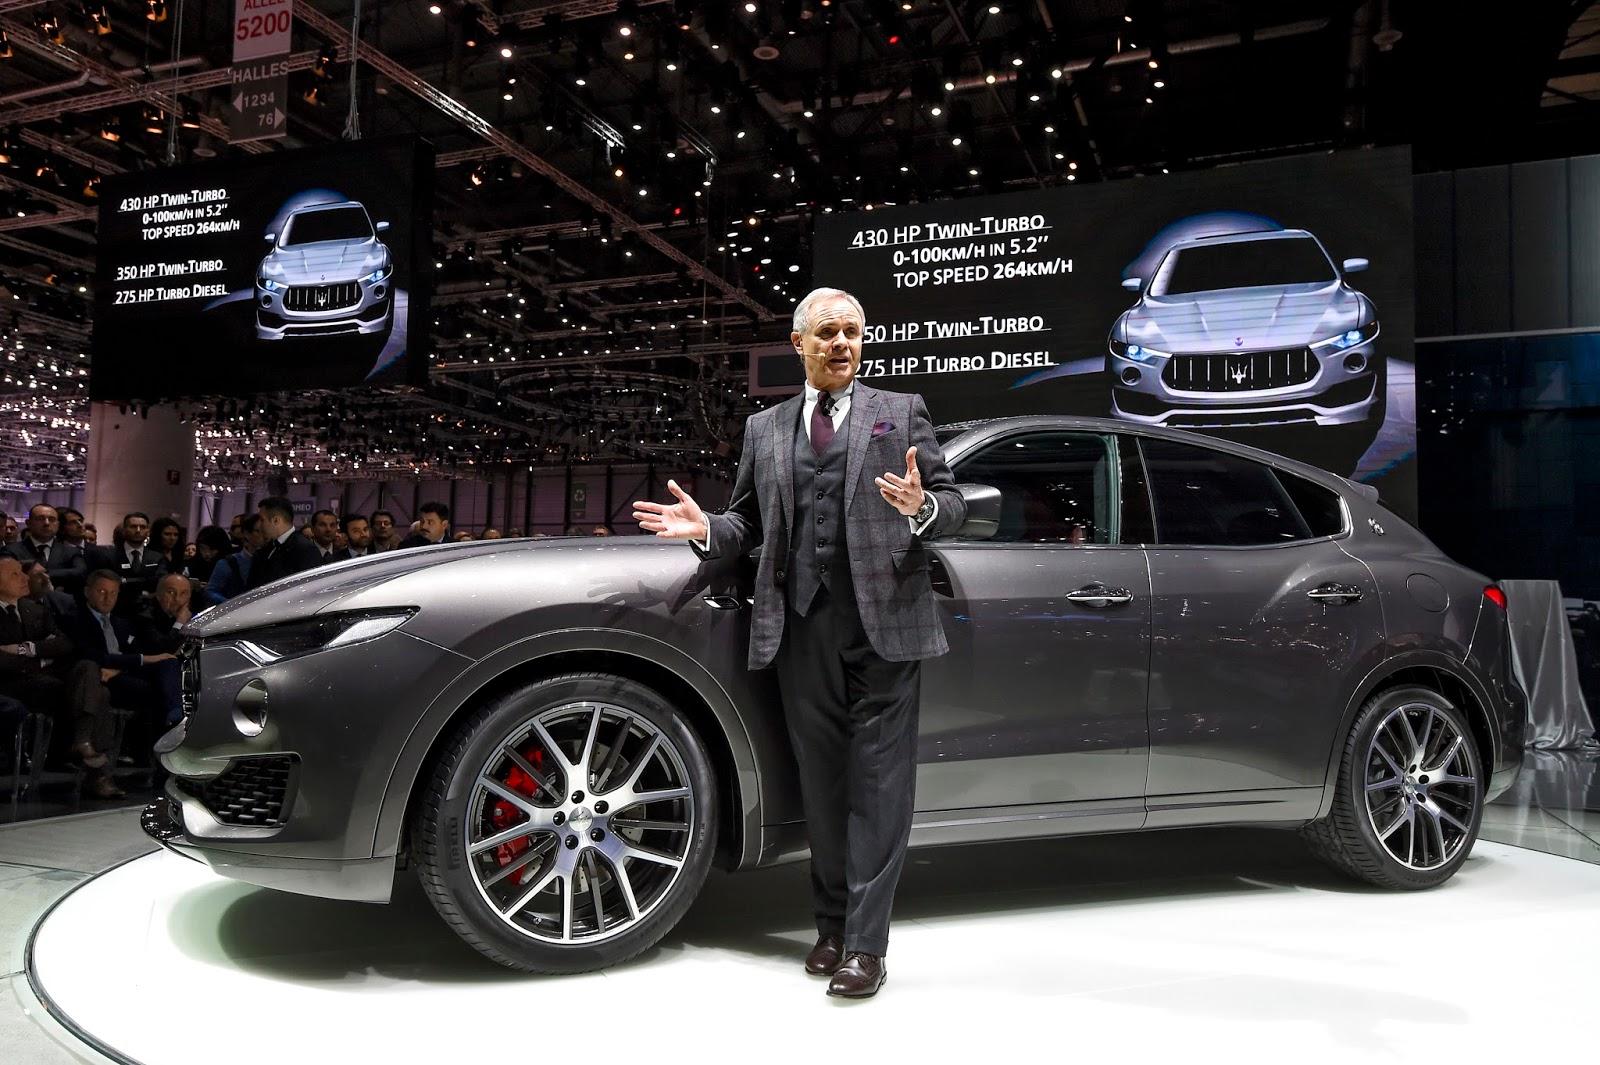 56d5807e9042c Τα πάντα για το πρώτο SUV της Maserati autoshow, Maserati, Maserati Ghibli, Maserati Ghibli S, Maserati Ghibli S Q4, Maserati GranTurismo, Maserati Levante, Maserati Levante S, Maserati Quattroporte, zblog